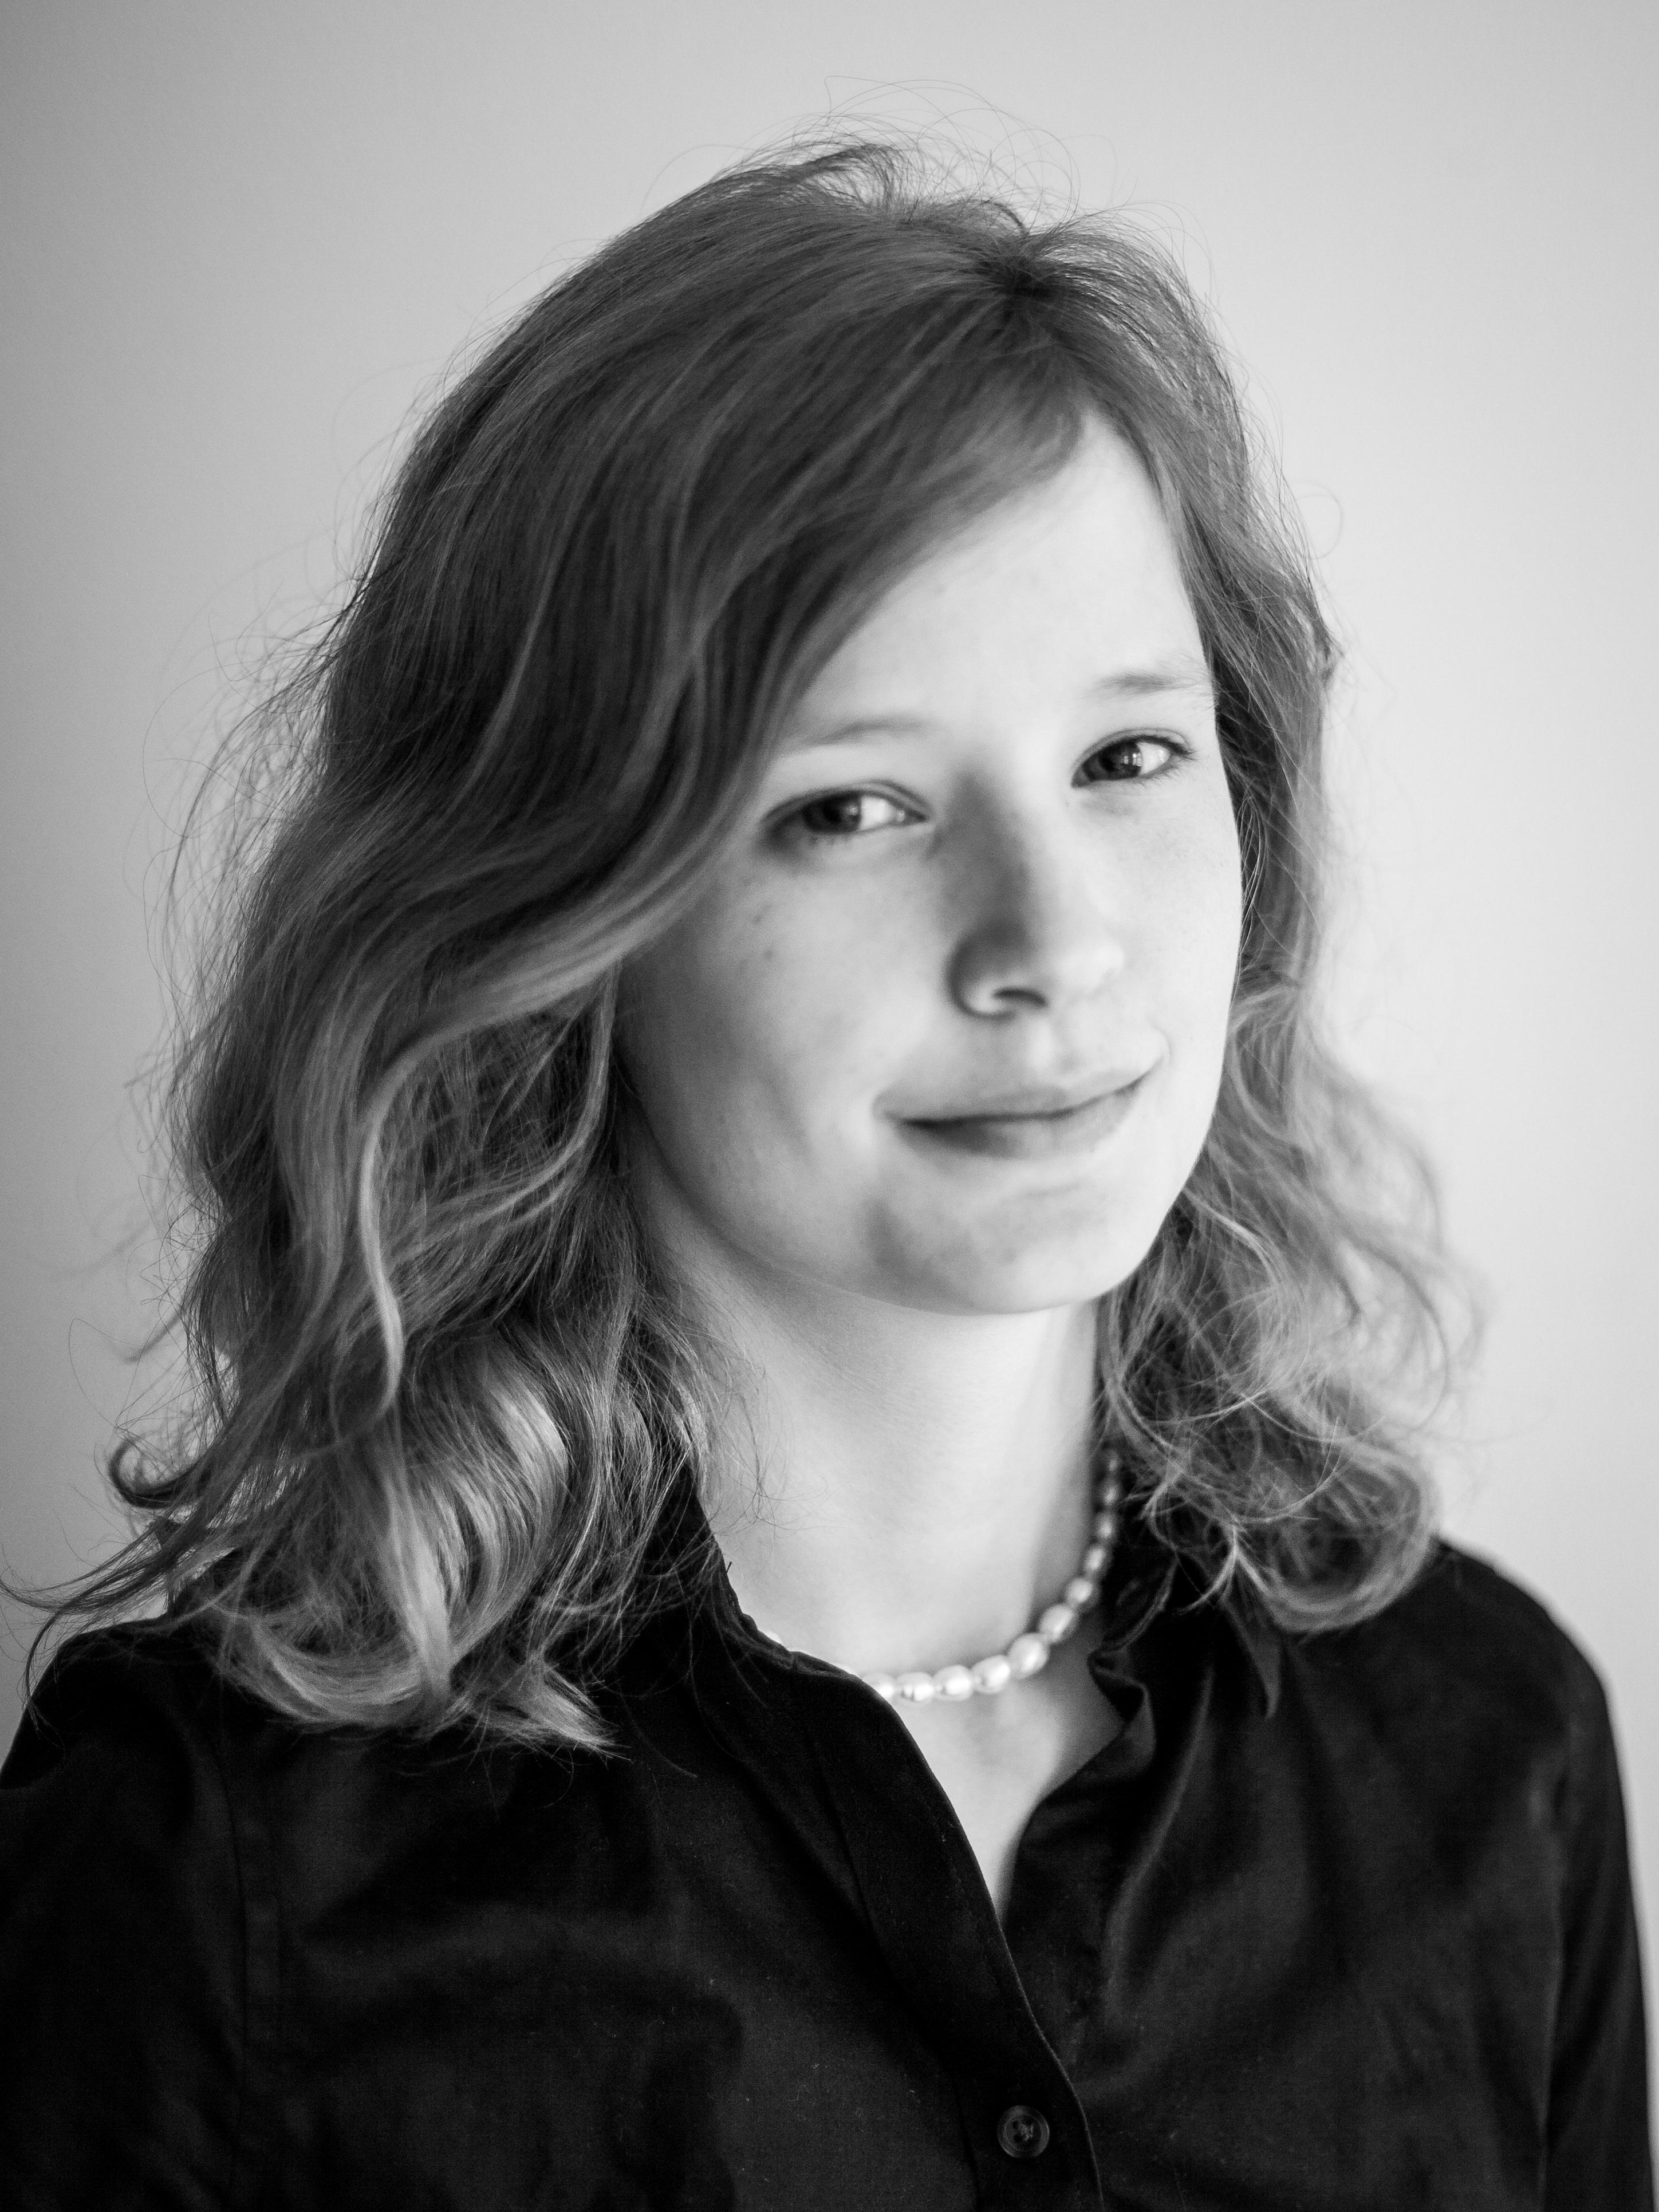 Helga Molbæk-Steensig